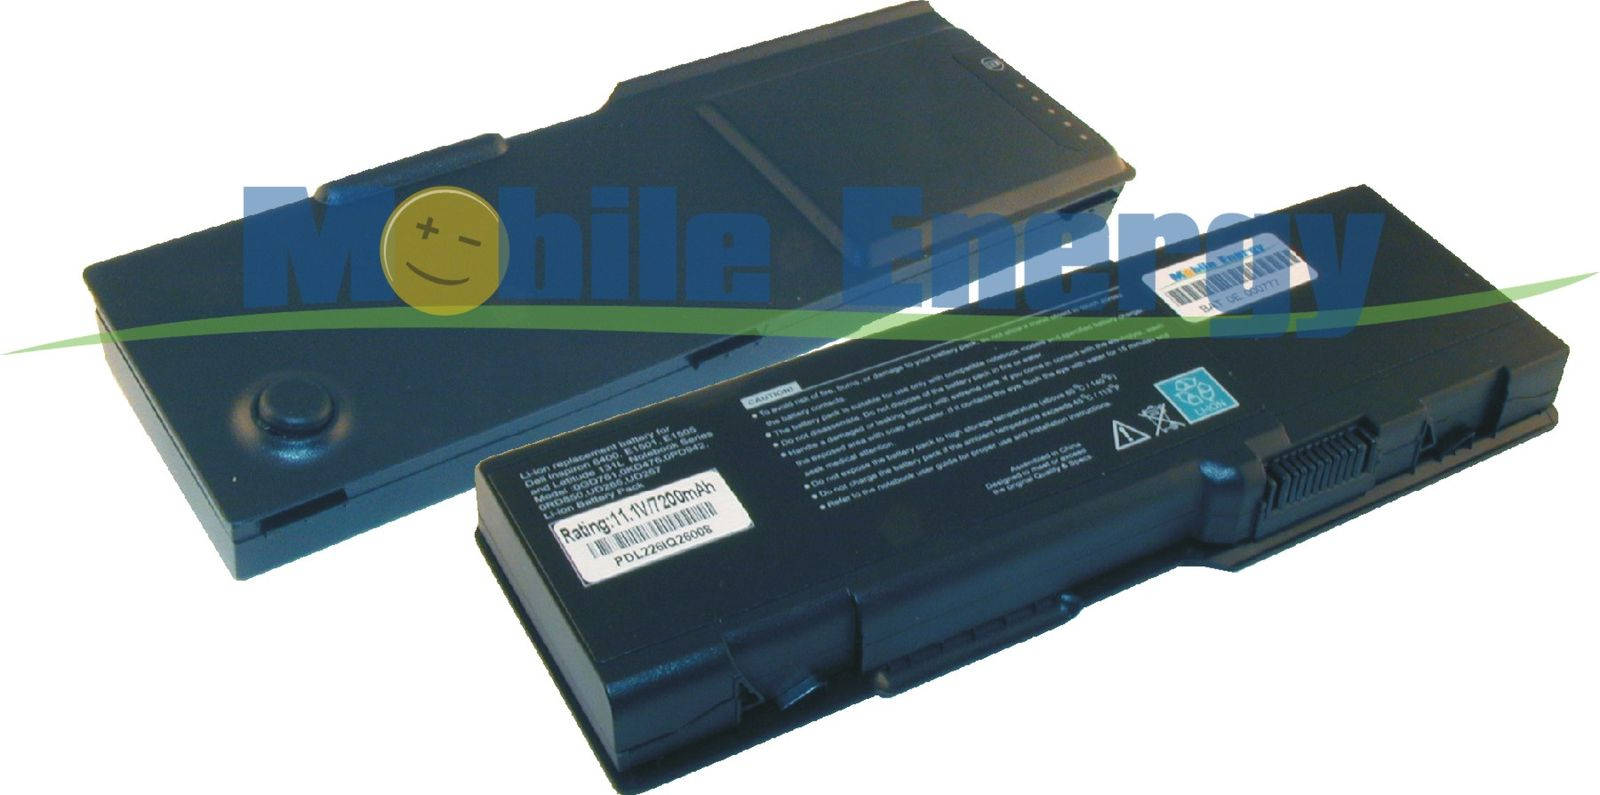 Mobile-Energy Baterie DELL Inspiron 6400 / E1501 / E1505 - 11.1v